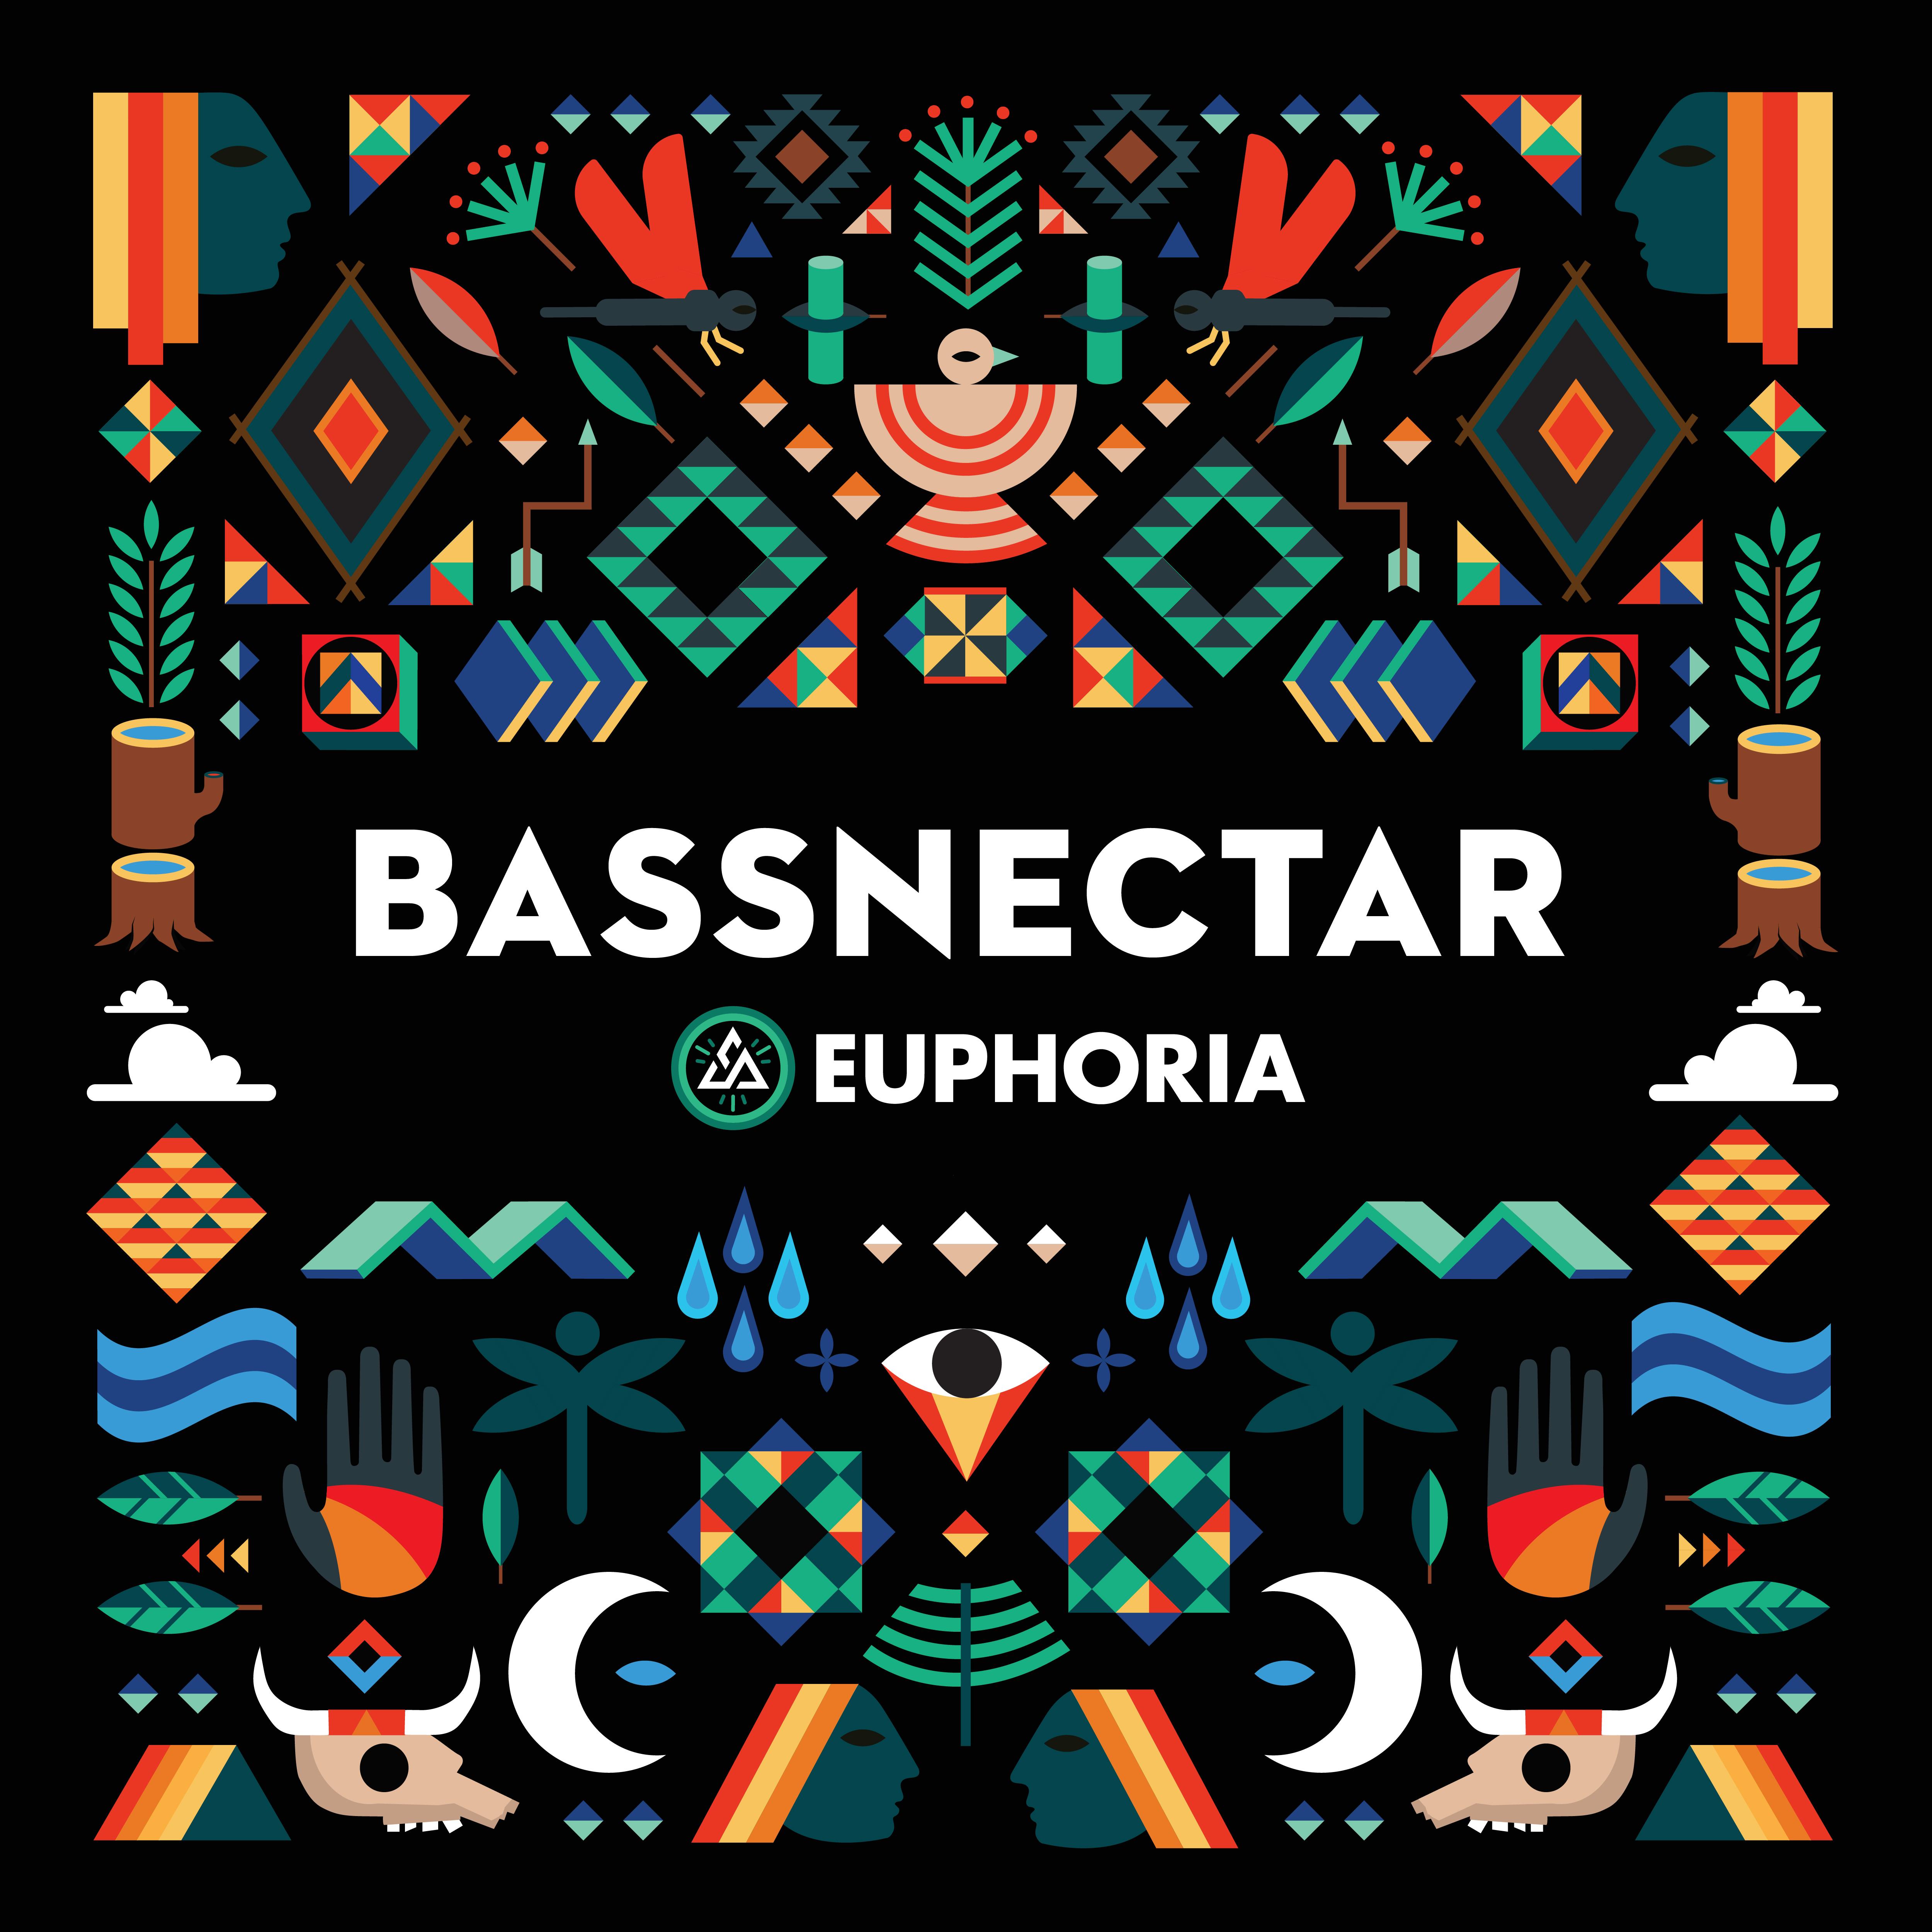 Bassnectar To Headline euphoria music festival aoxoa